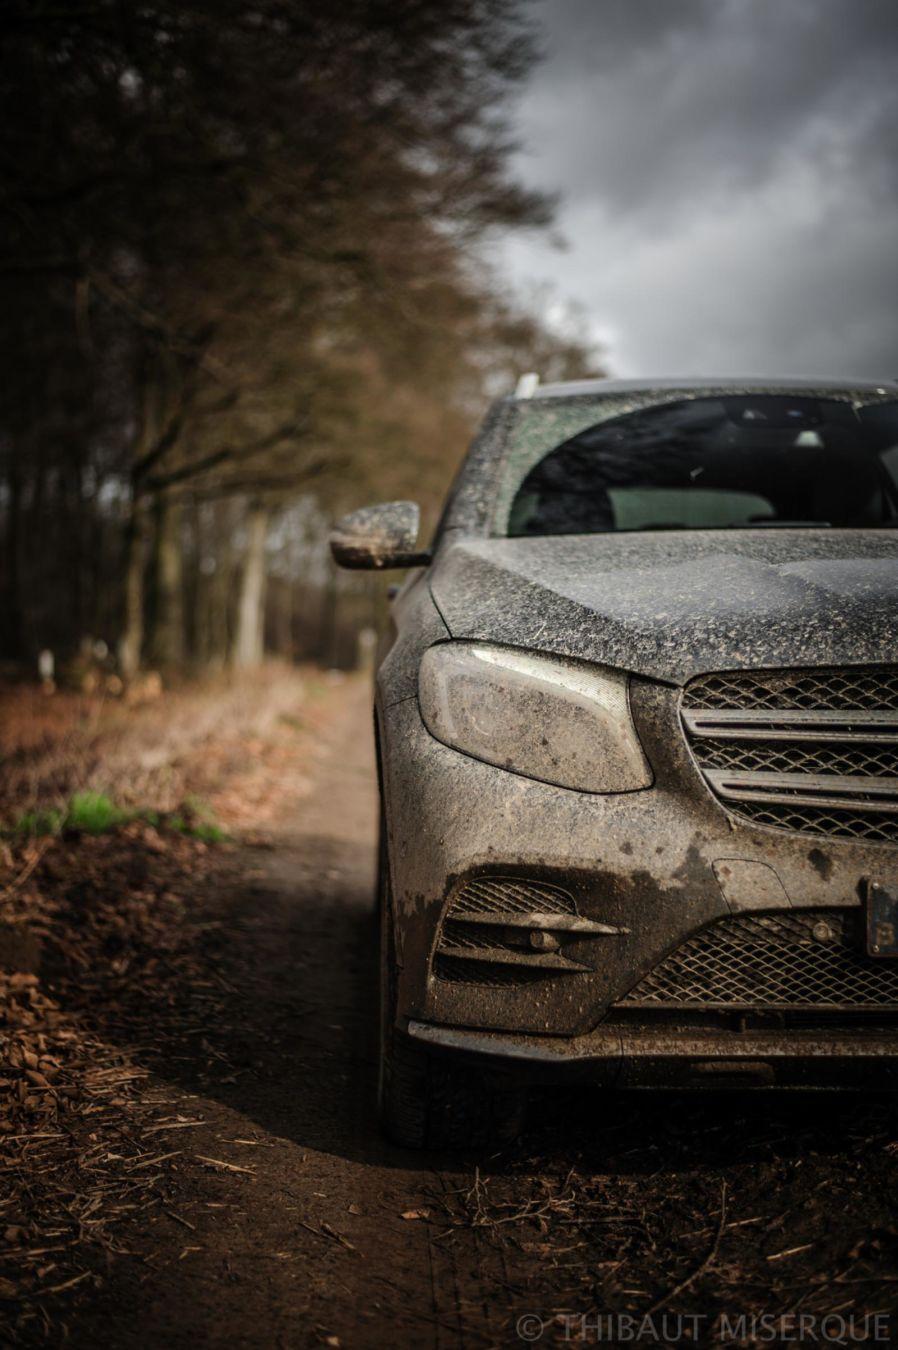 Mercedes_GLC_220d_4Matic